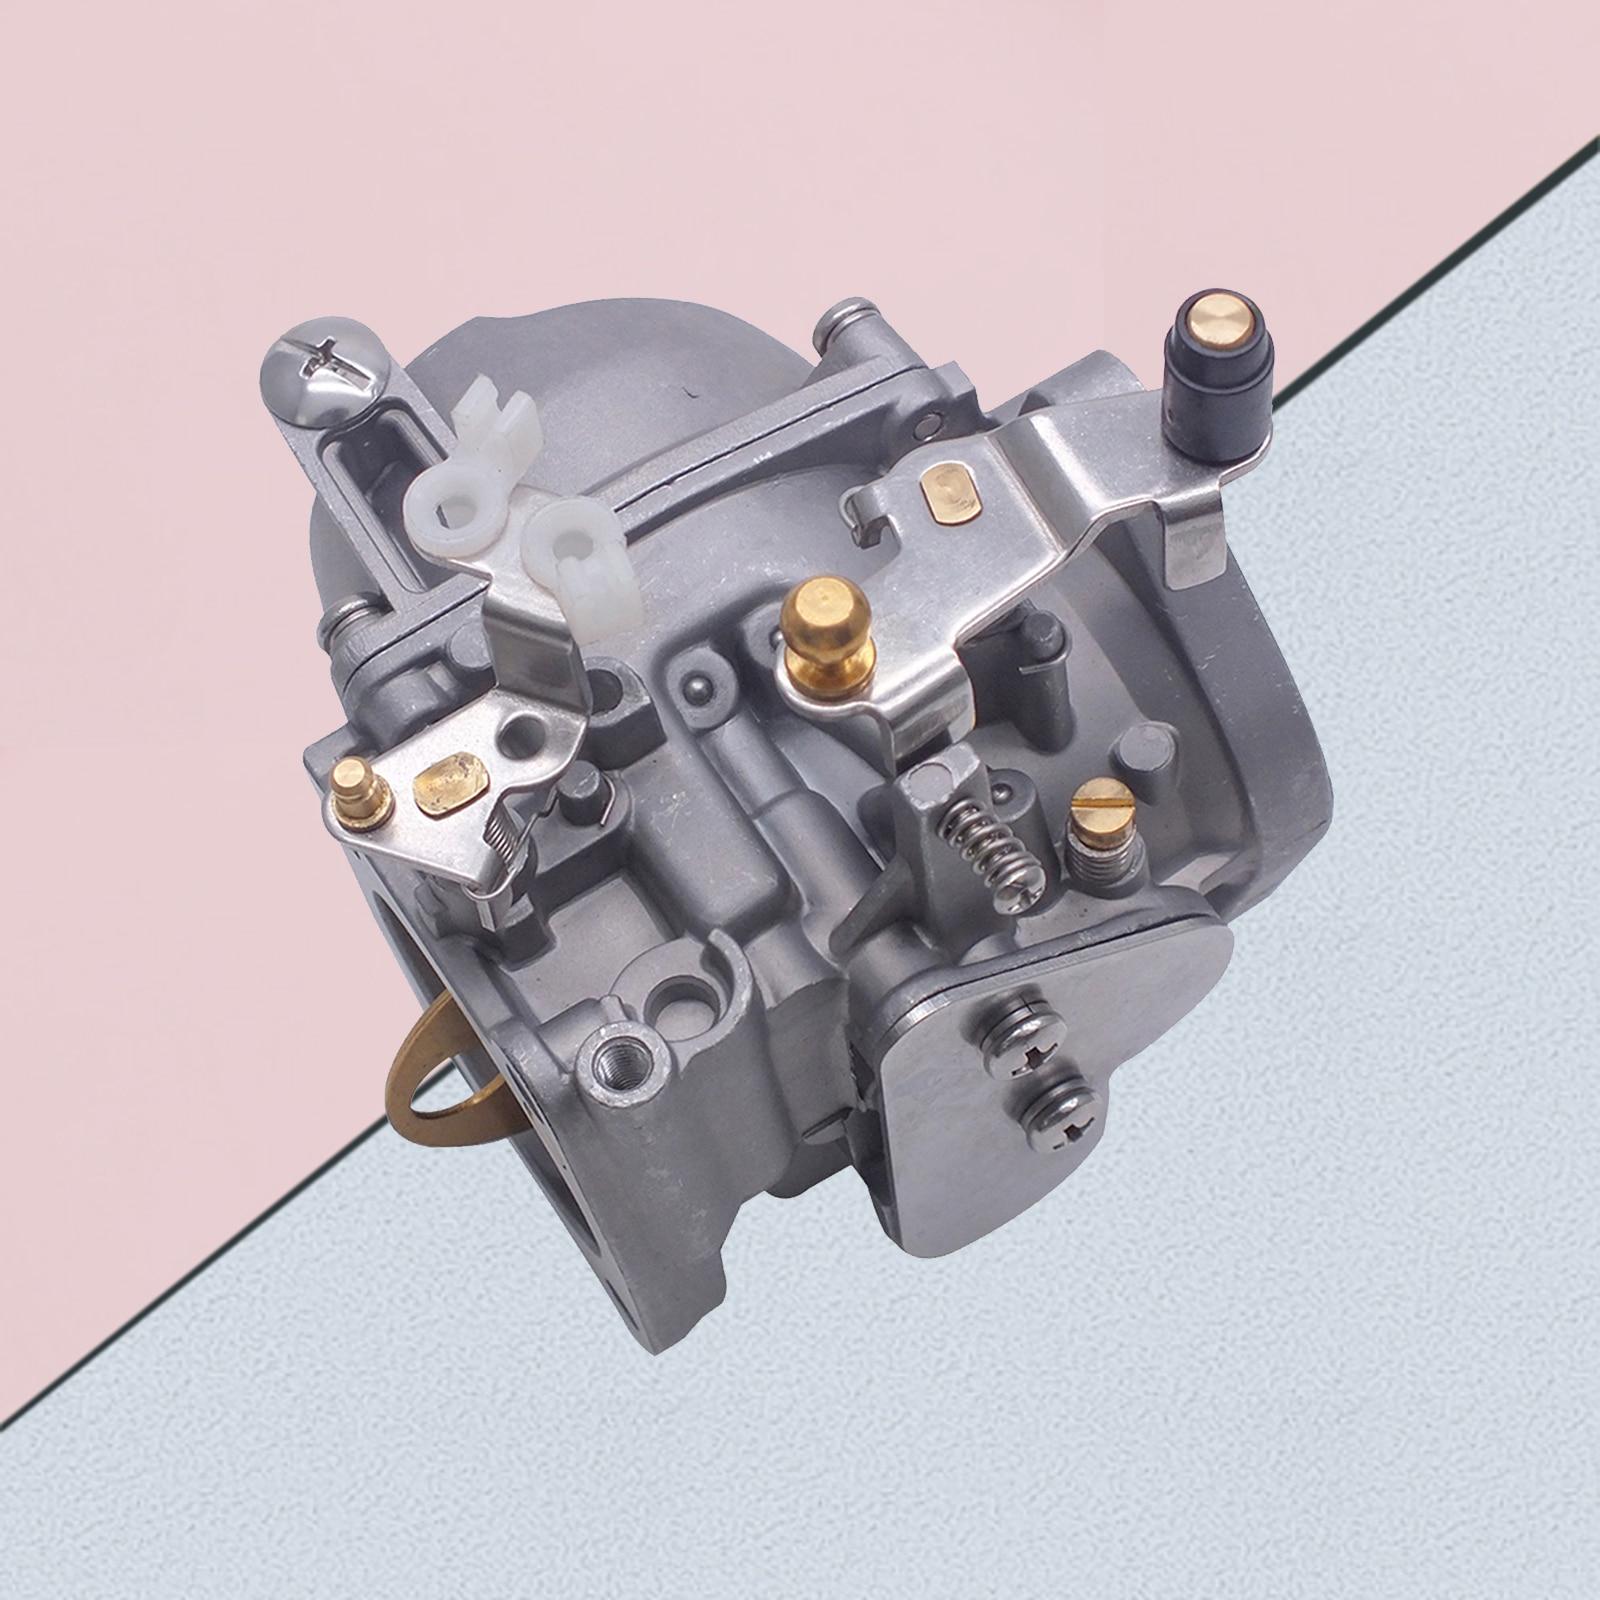 Replacements Carburetor Fit for Yamaha 3-cylinder 85 HP 2-Stroke Outboard Engine Motors enlarge